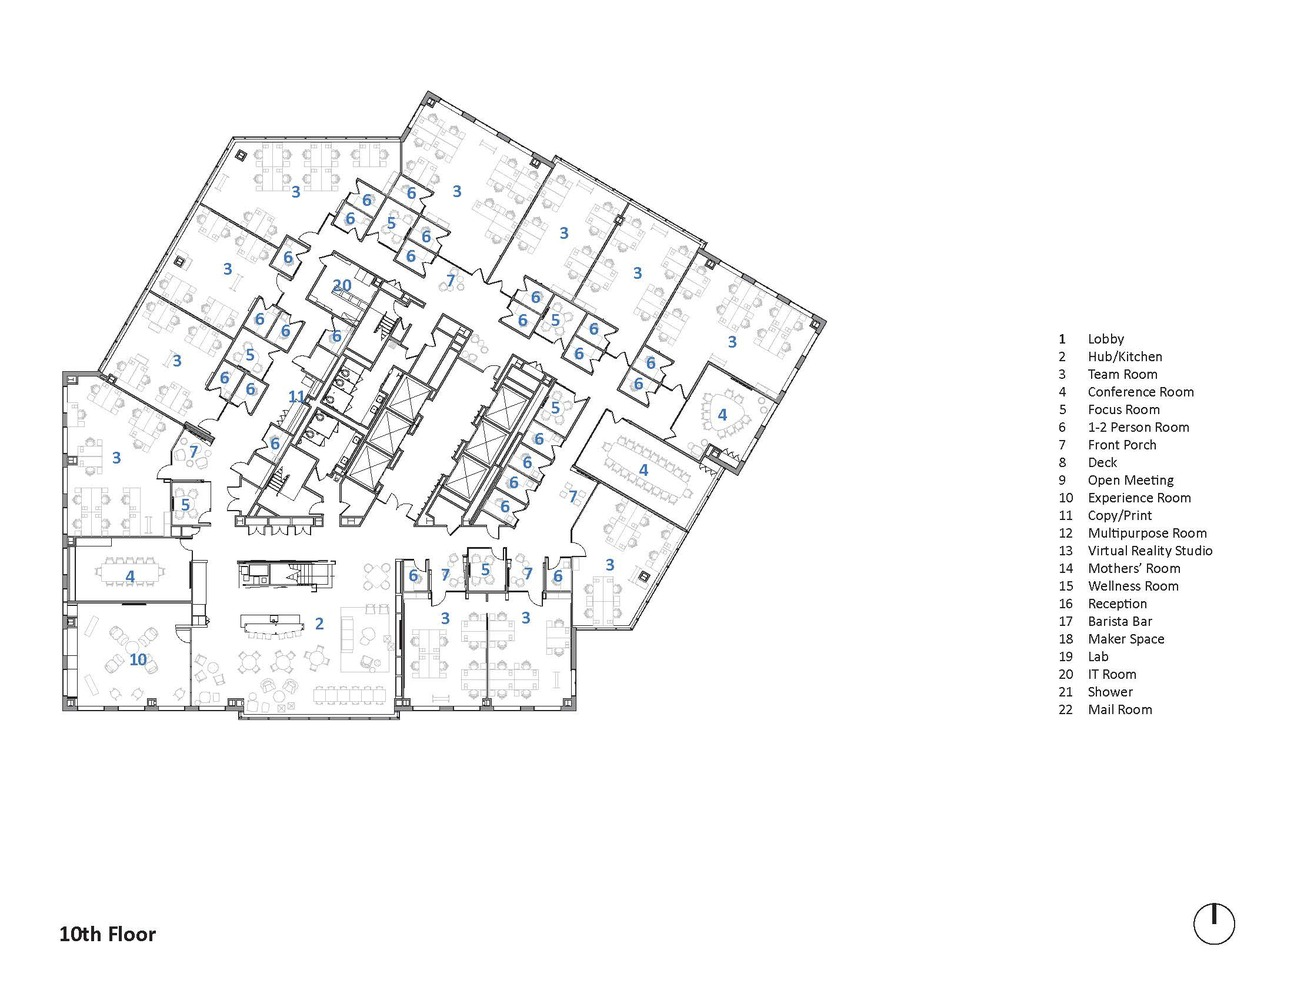 microsoft new england research development center sasaki tenth floor plan [ 1294 x 1000 Pixel ]